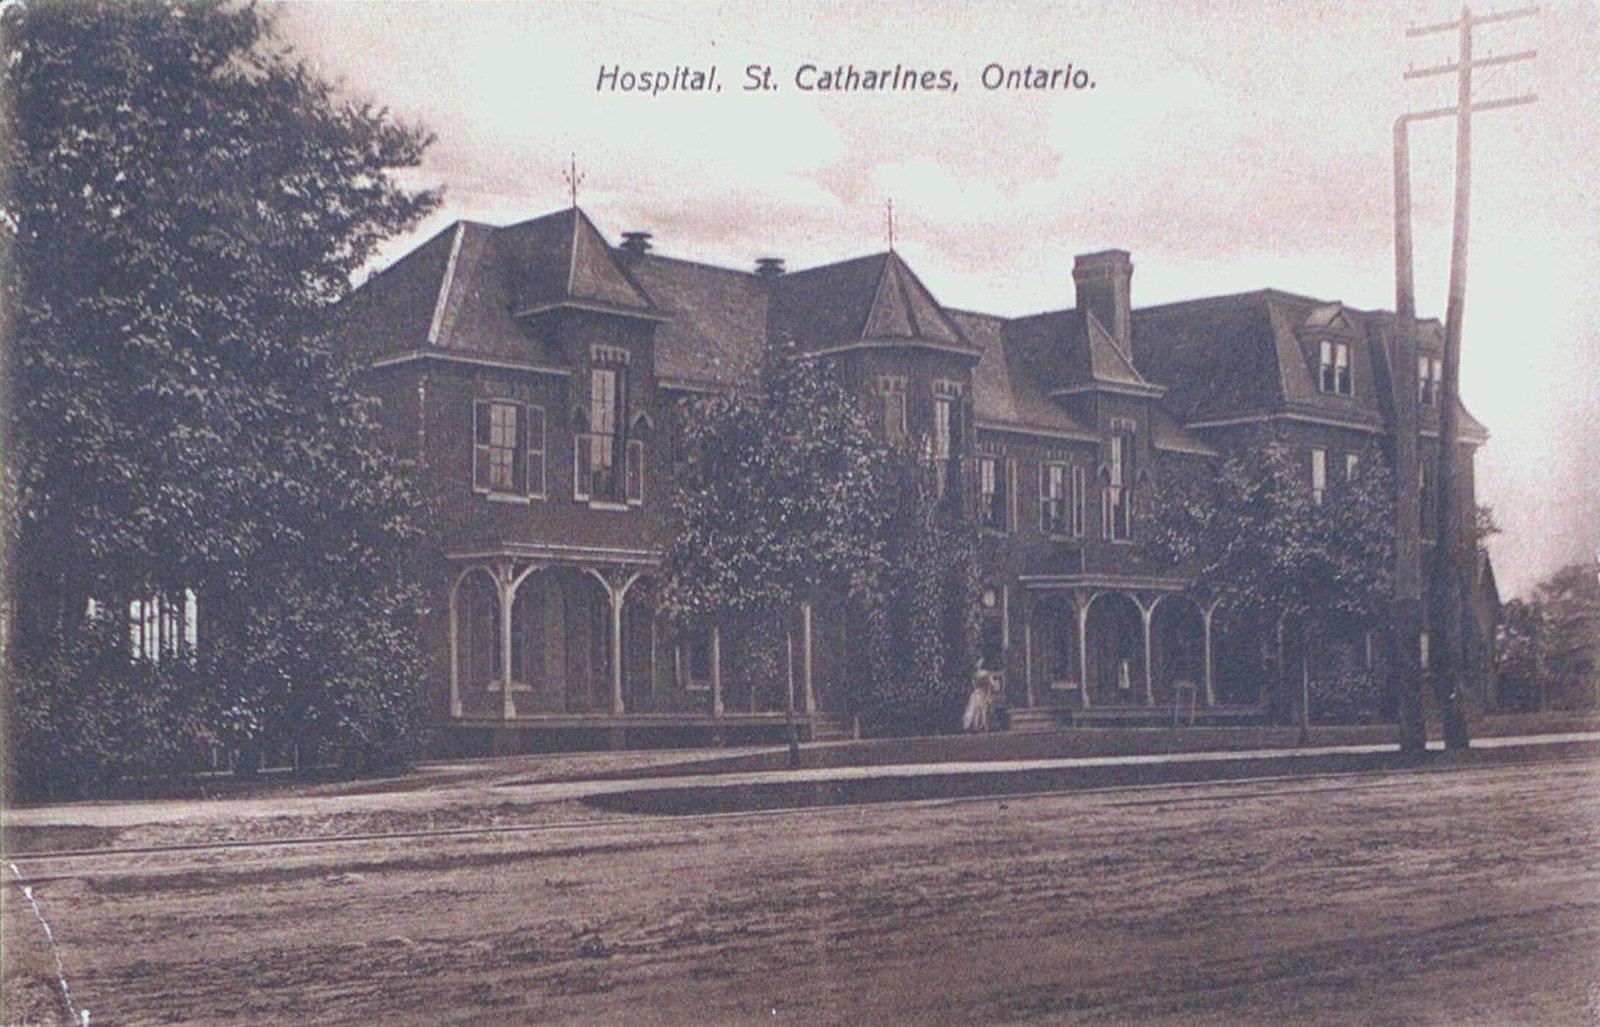 St. Catharines General Hospital